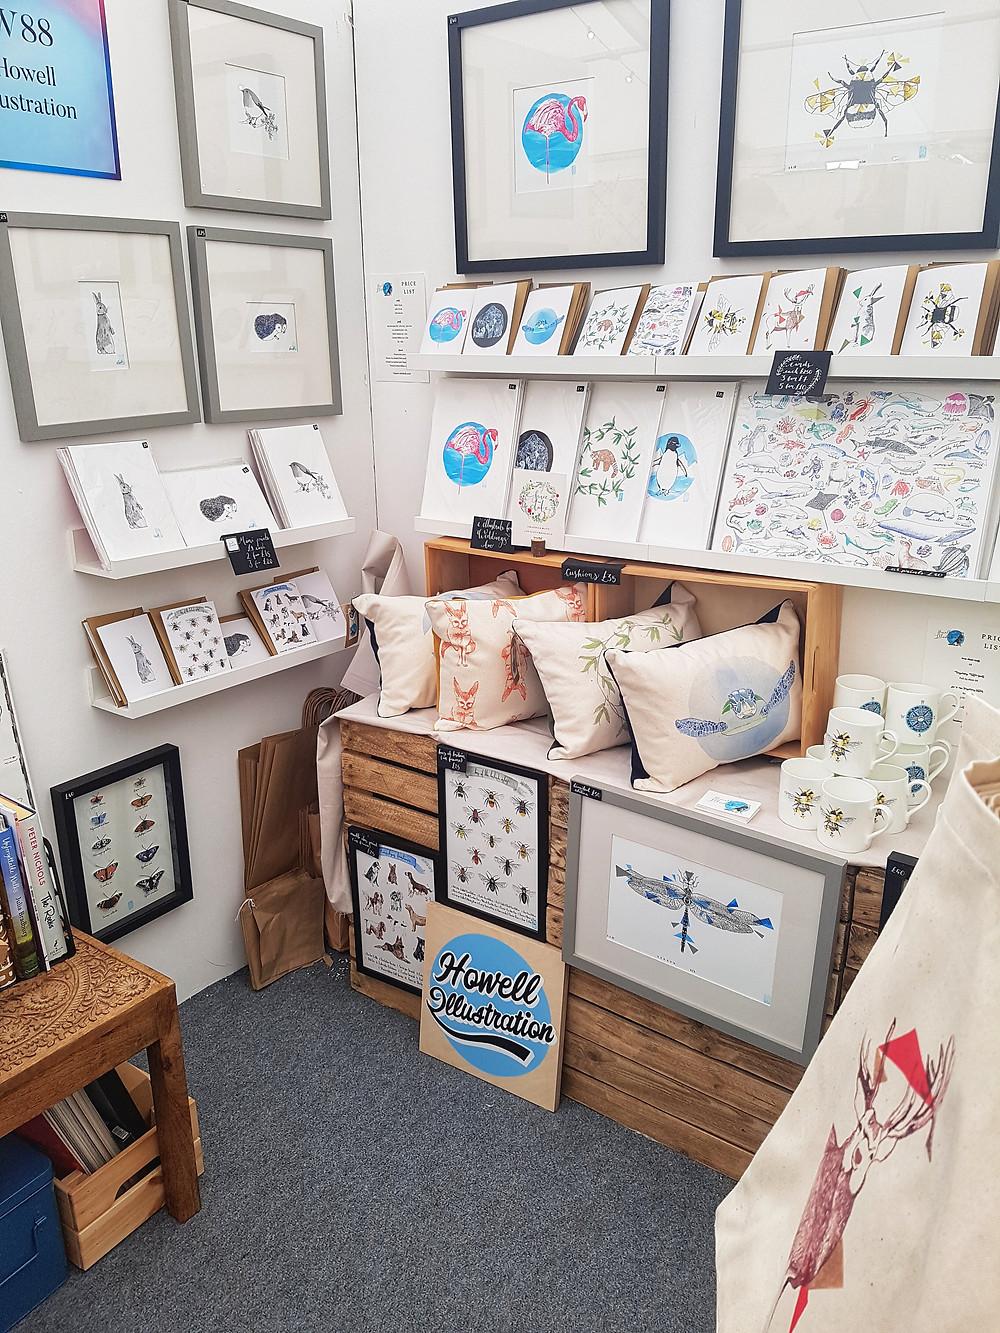 Howell Illustration at The Handmade Fair in 2019